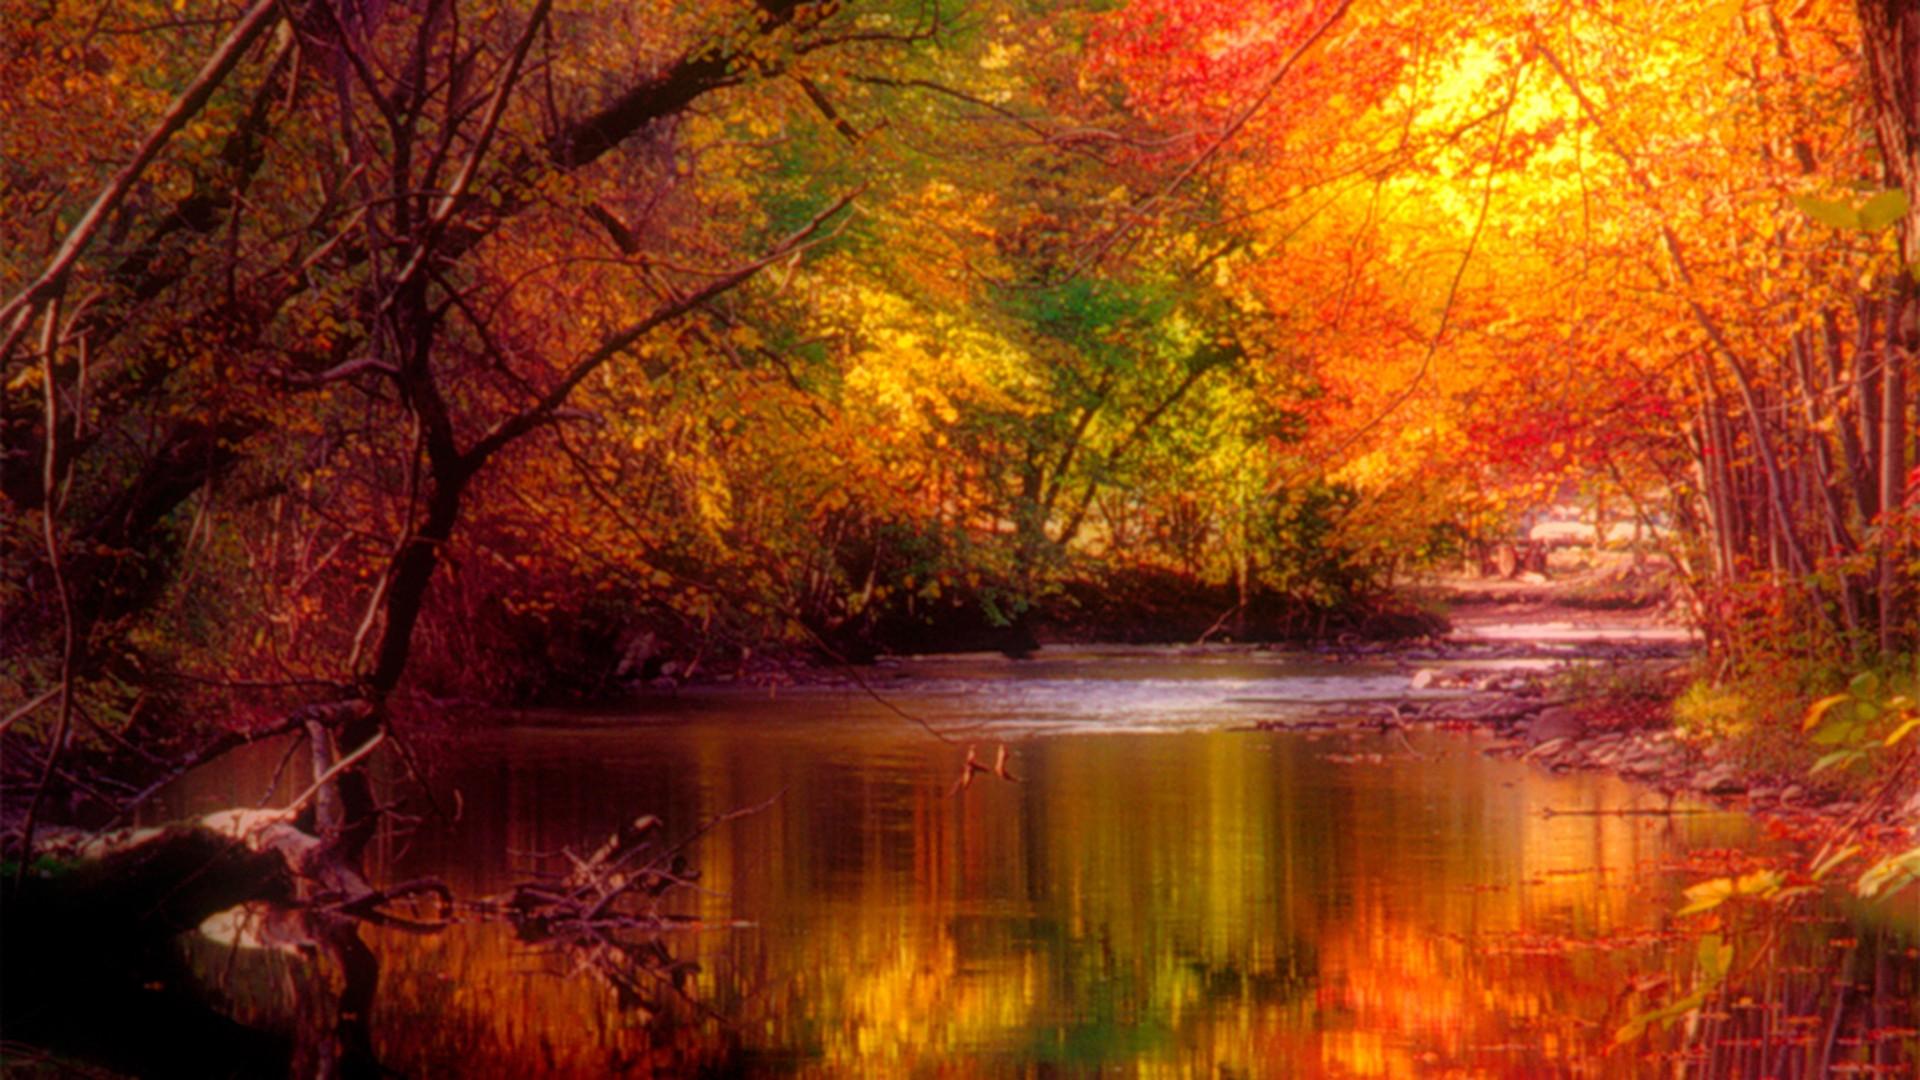 Wordless Wednesday – Autumn Reflections | Booknvolume